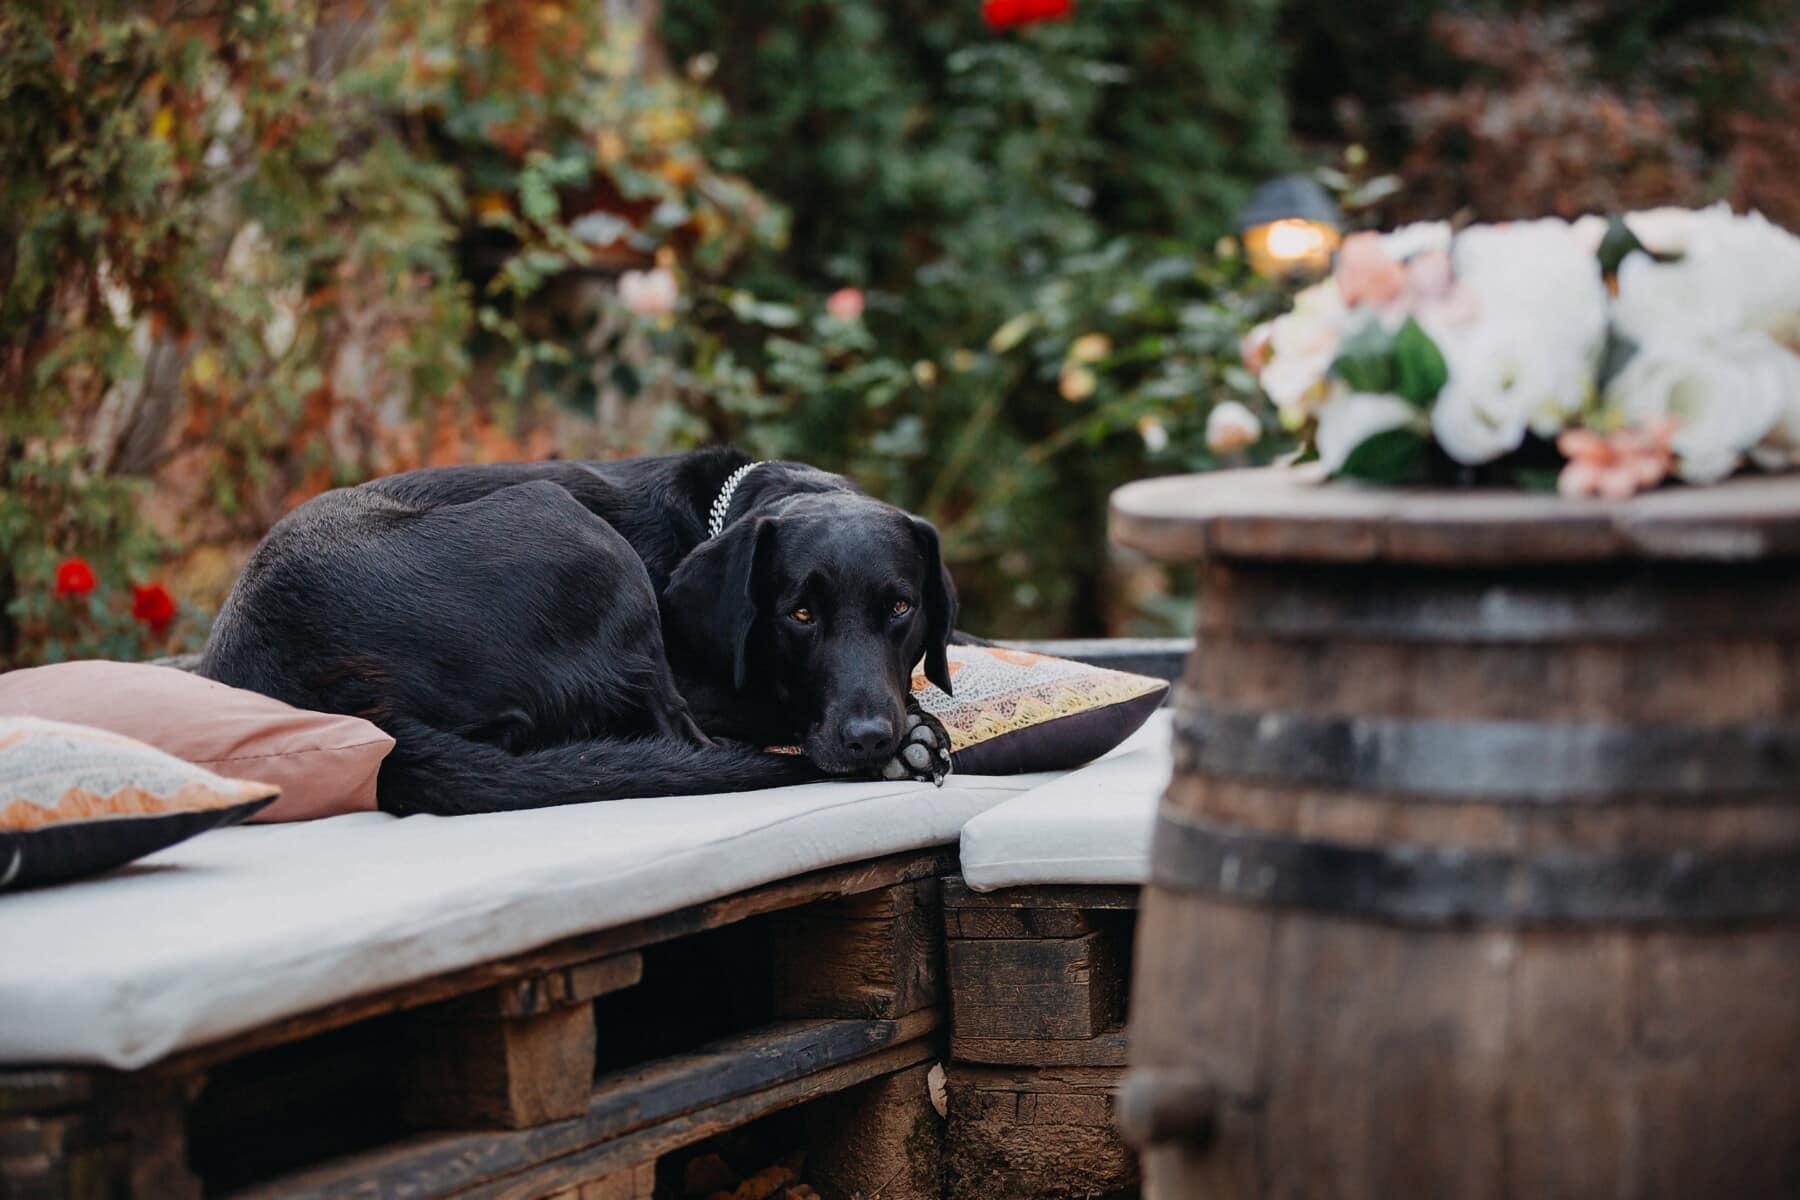 Hund, Schwarz, Verlegung, Fass, Sitzbank, aus Holz, Gonczy Polski, Eckzahn, Welpe, Retriever